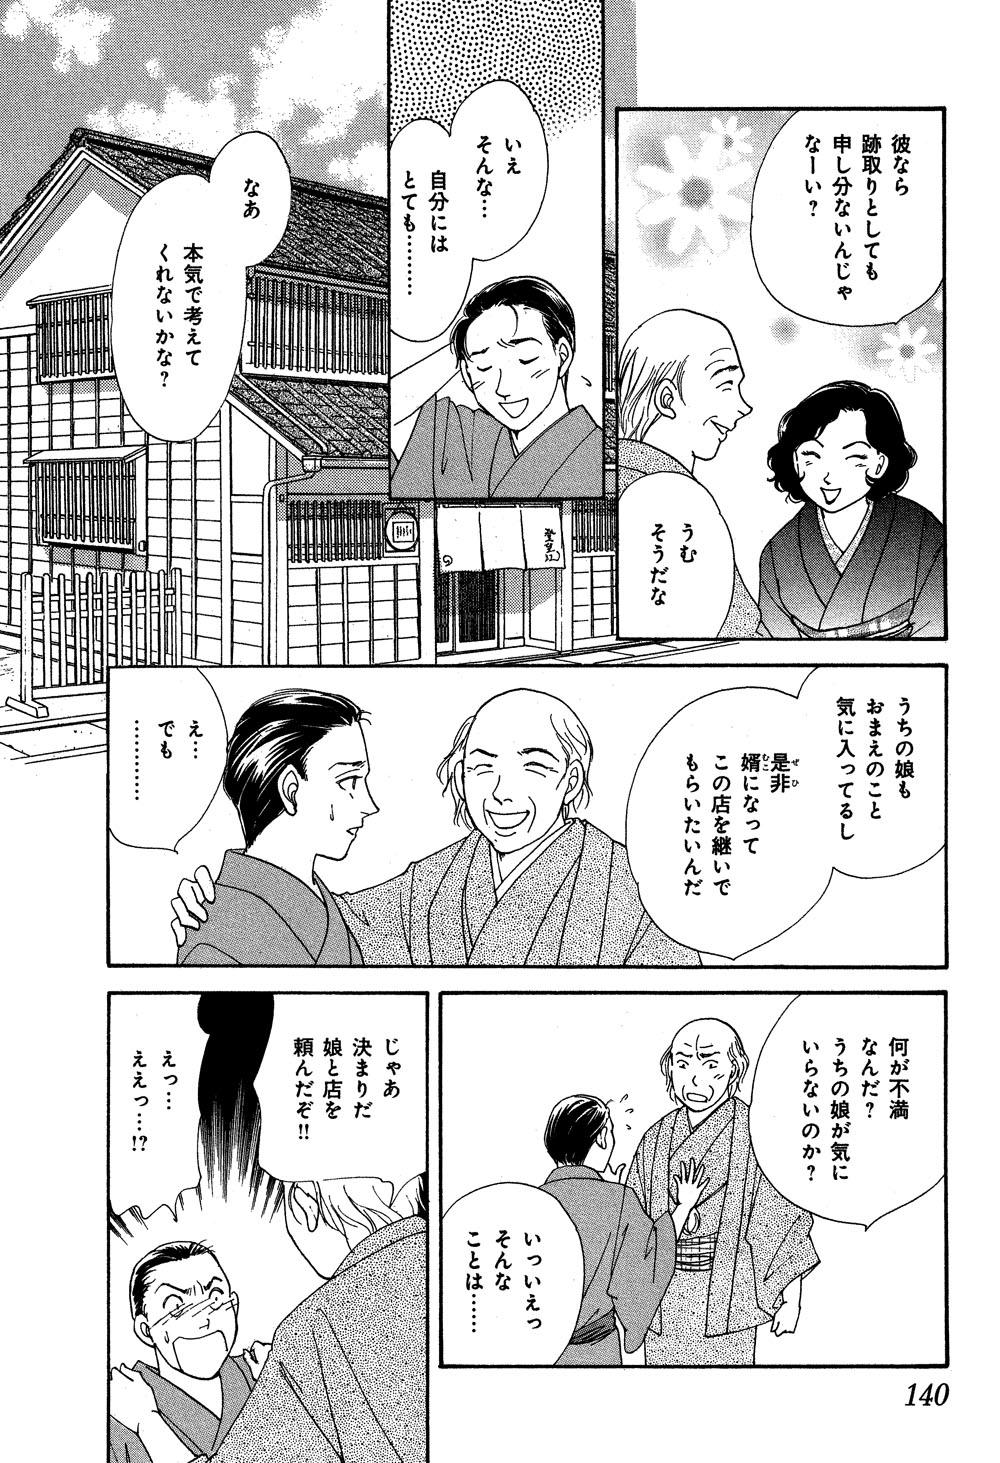 mayuri_0001_0140.jpg